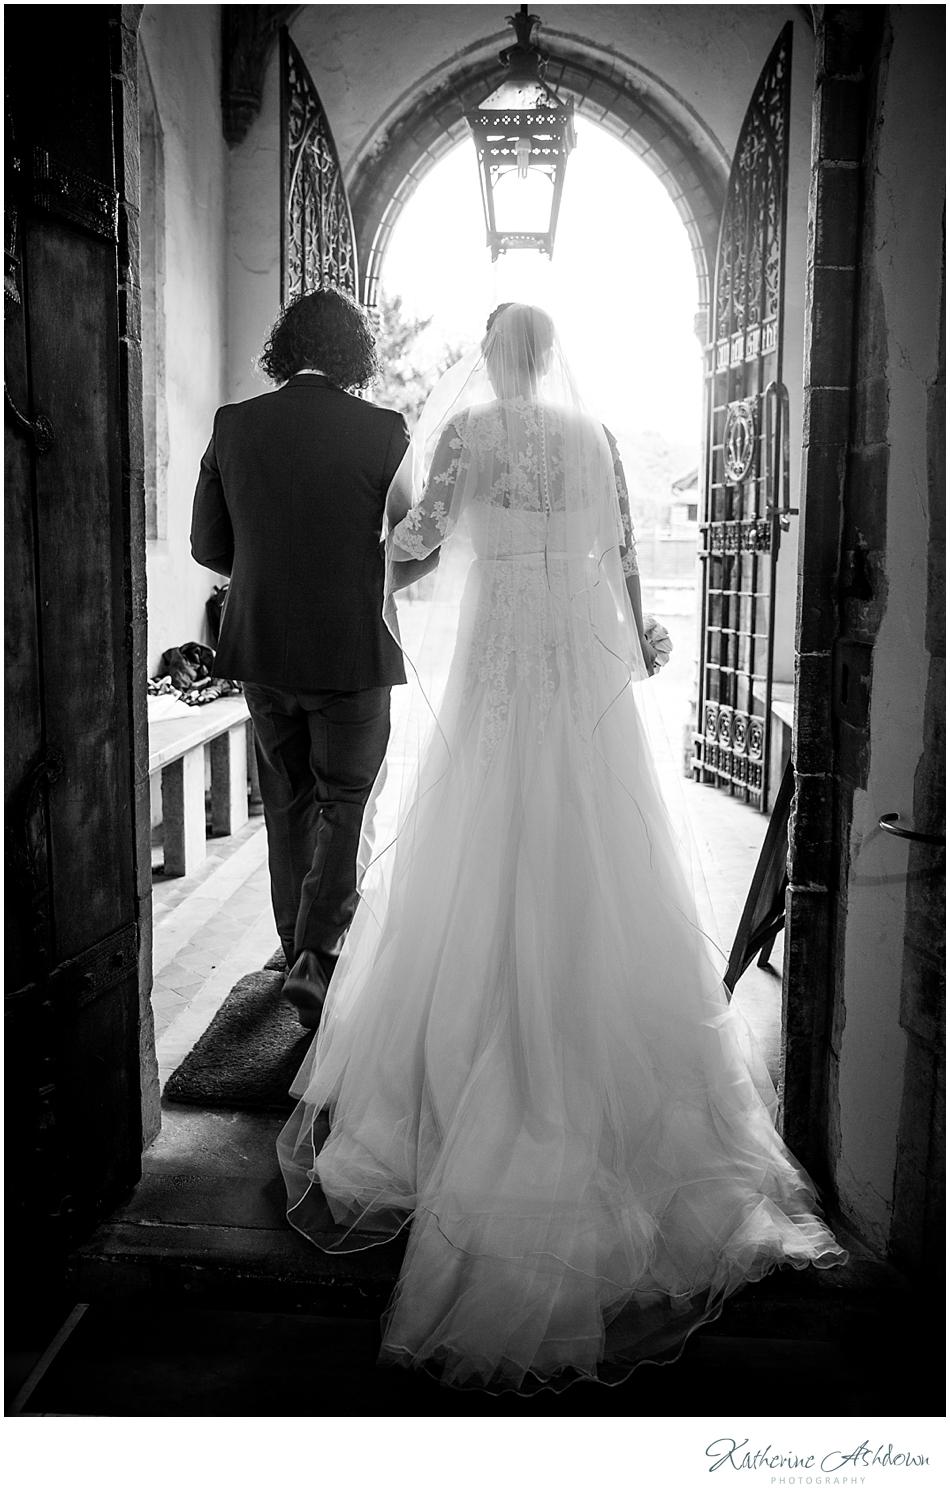 Katherine Ashdown Photography Wedding_035